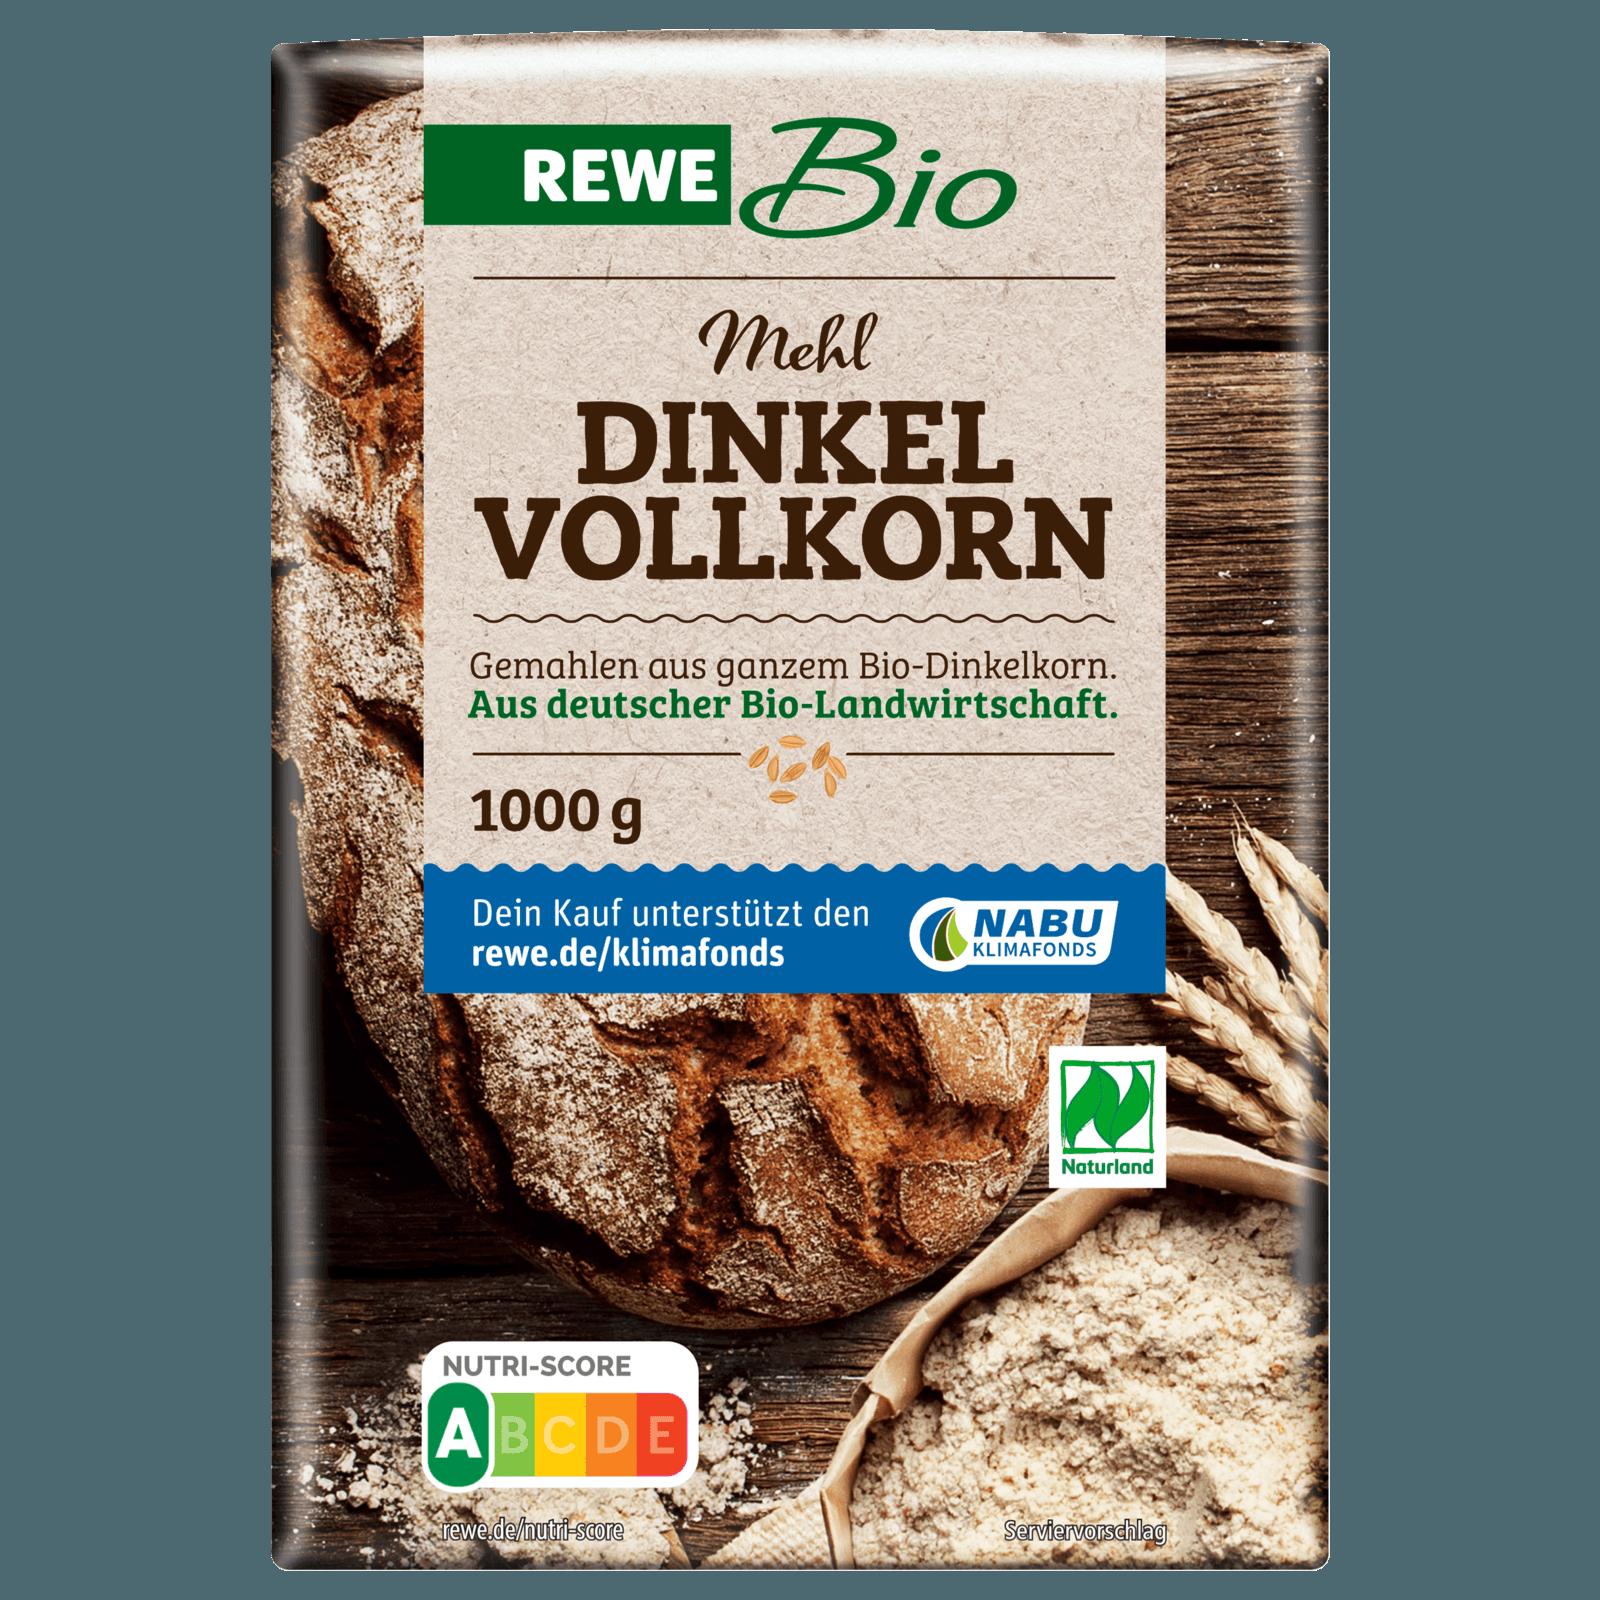 Rewe Bio Dinkel Vollkornmehl 1kg Bei Rewe Online Bestellen